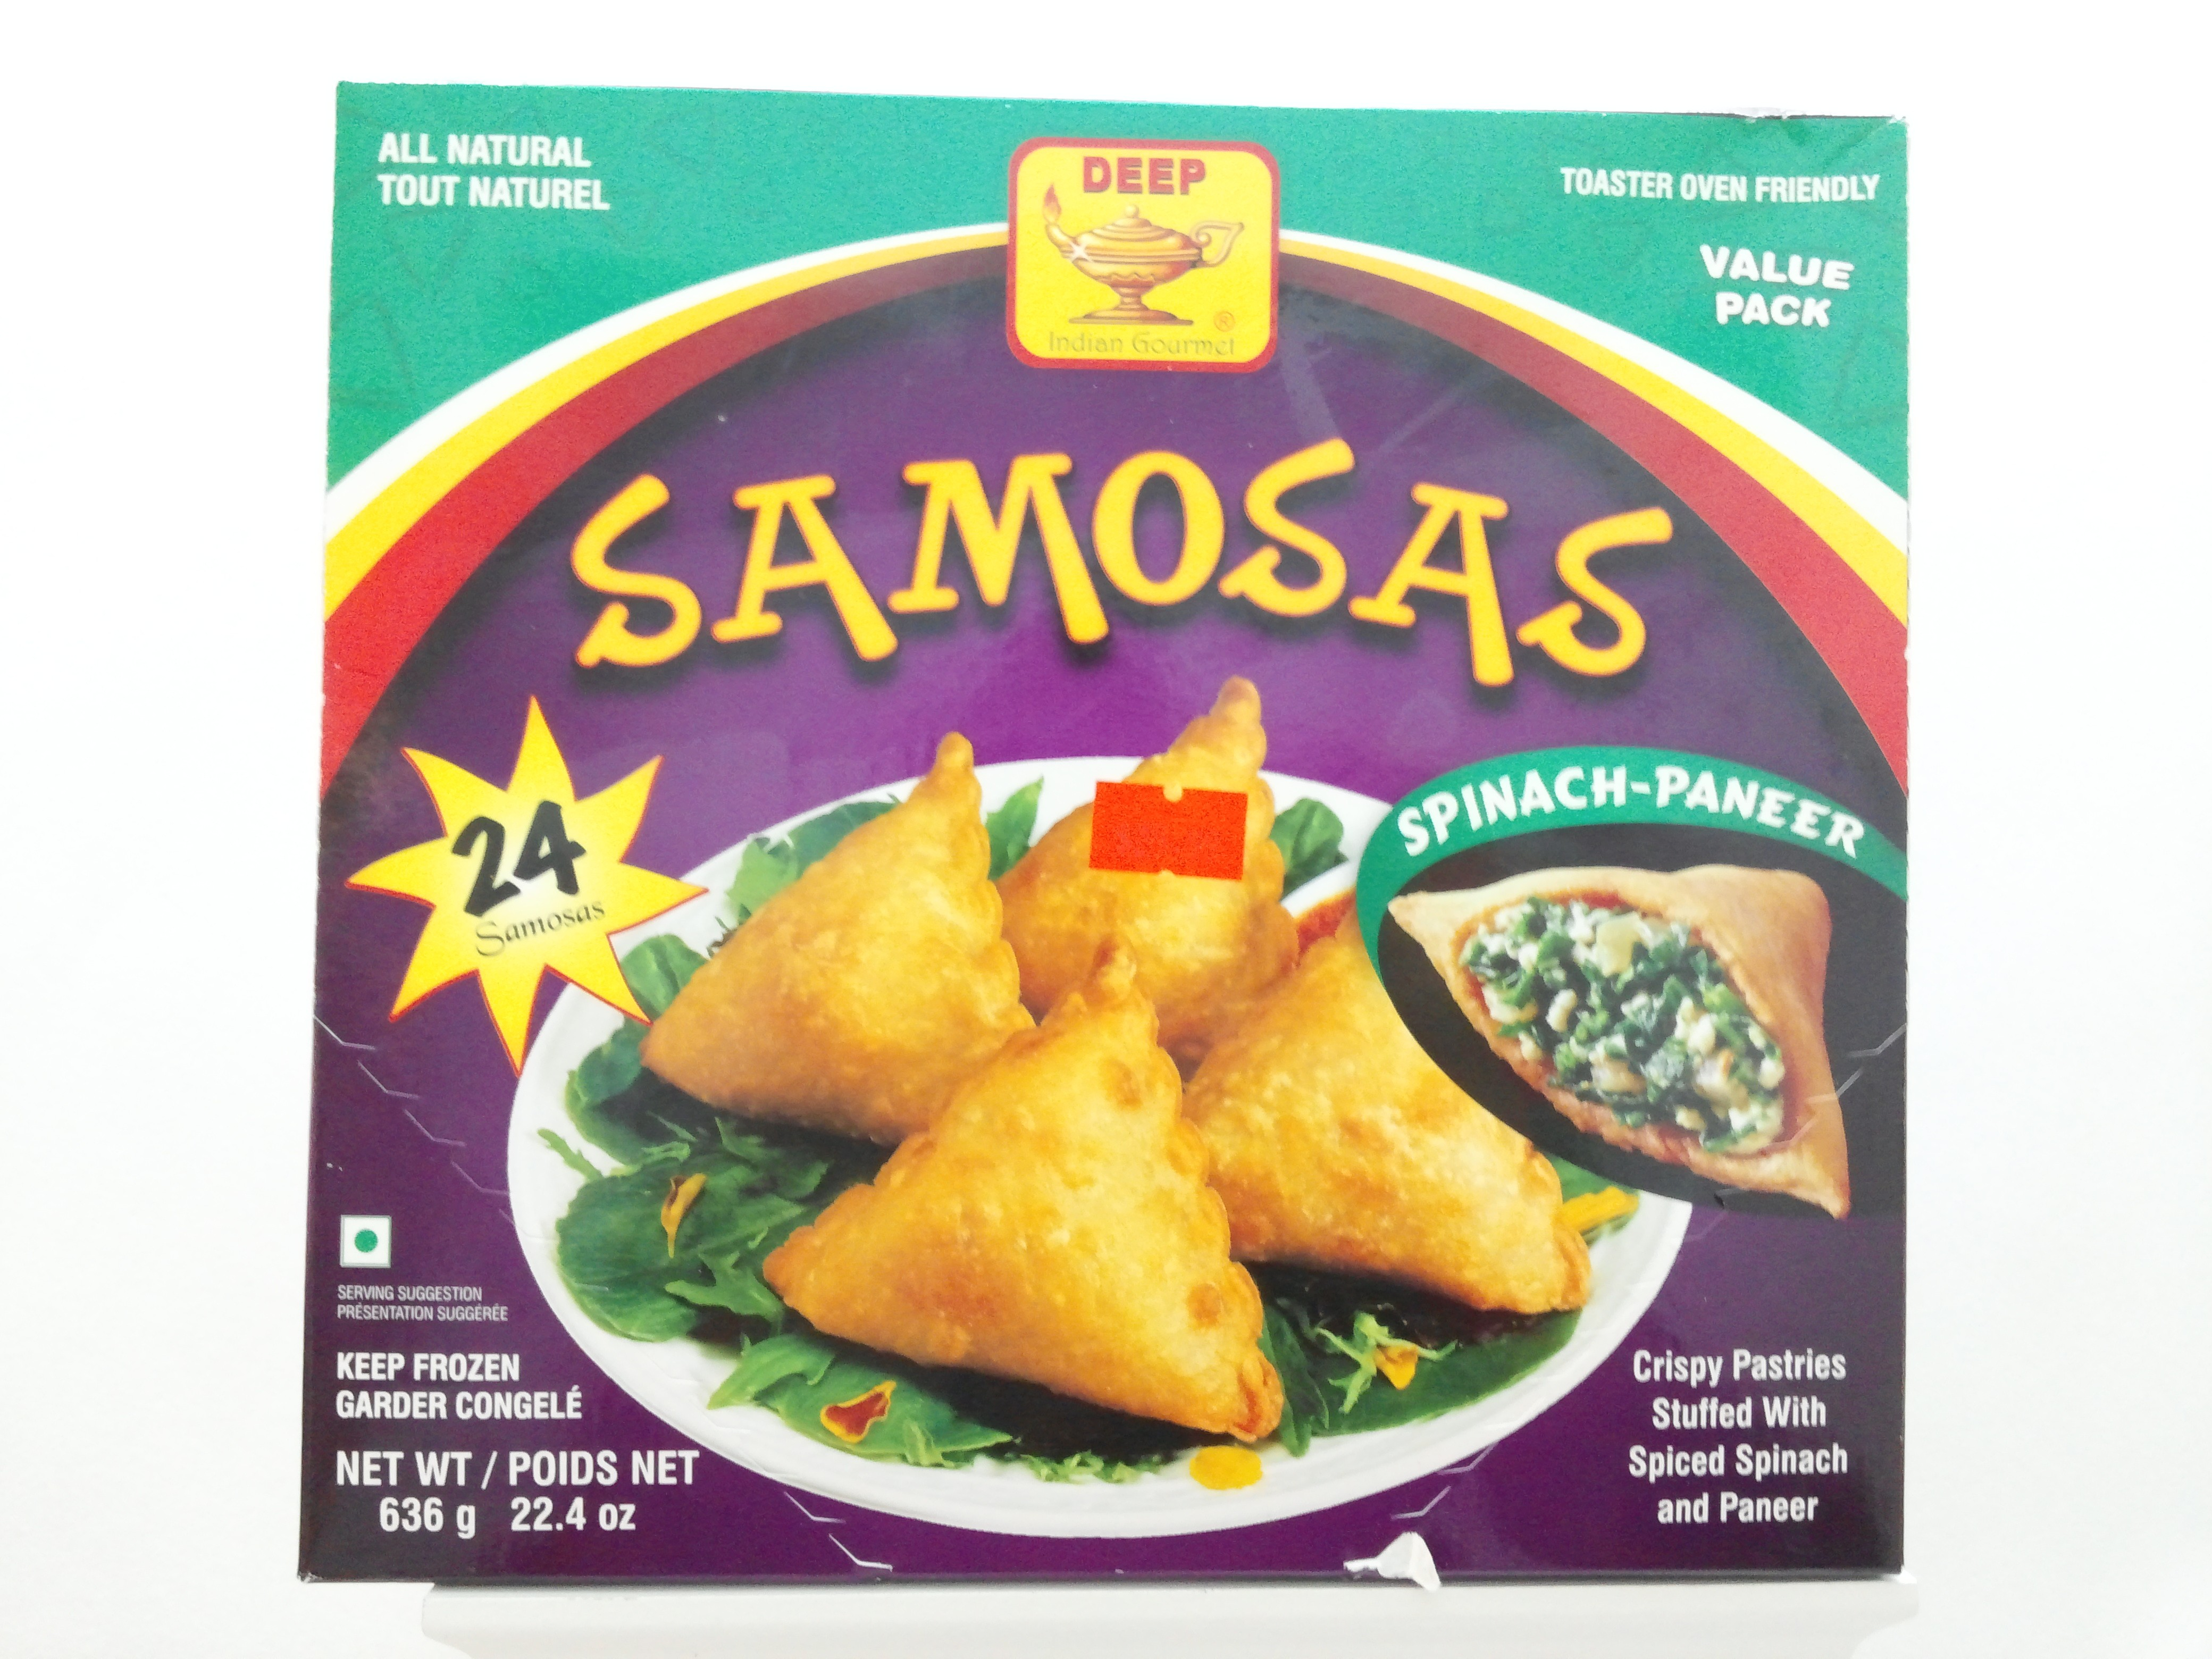 Deep Samosas Spinach-Paneer 24 pcs 22.4 oz